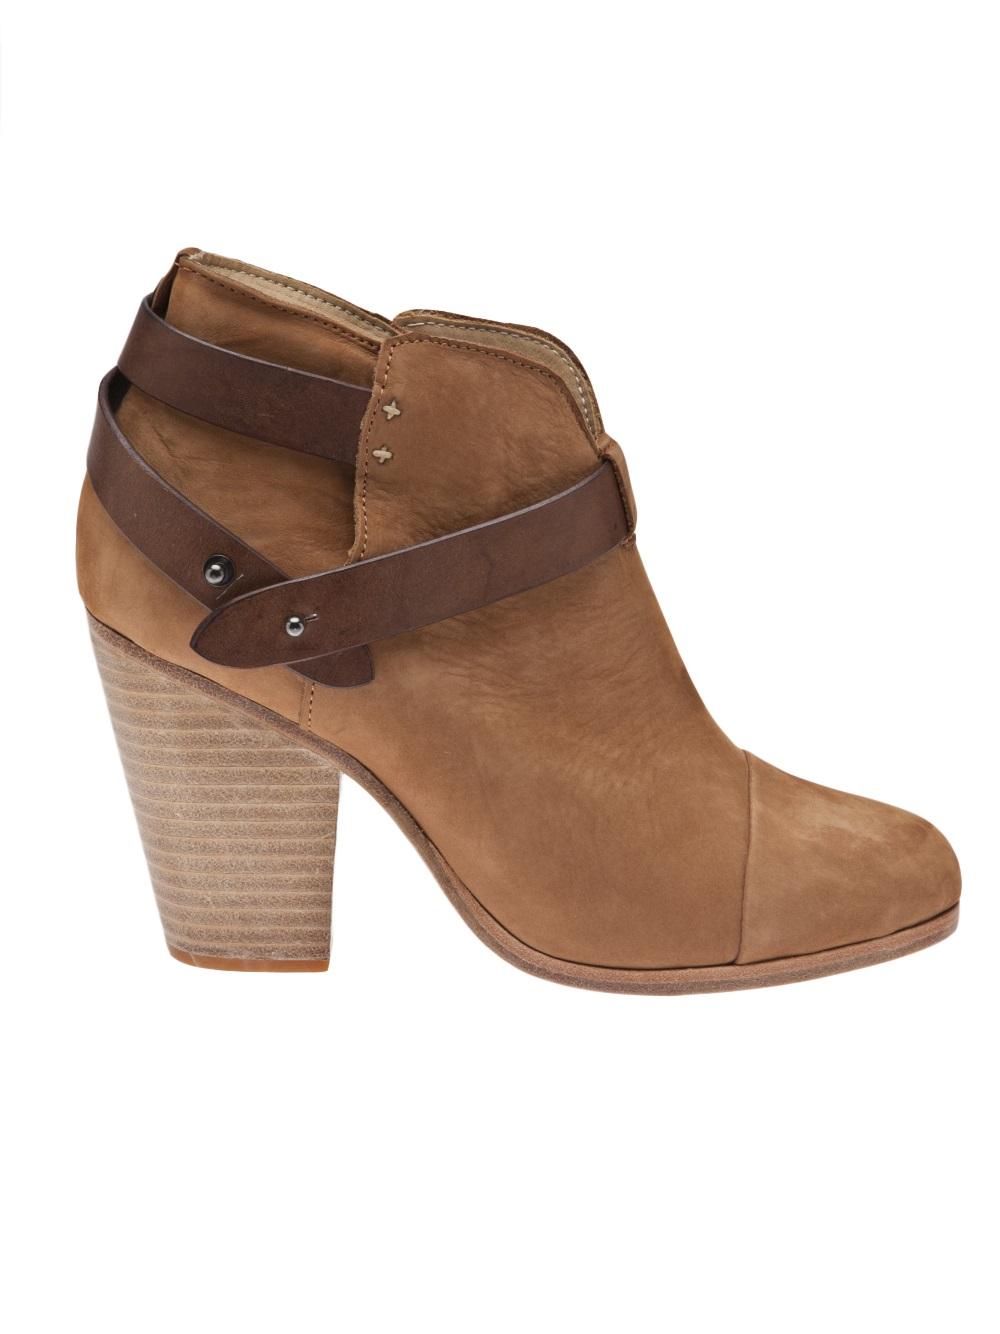 Rag & Bone Harrow Boot in Camel (Brown)